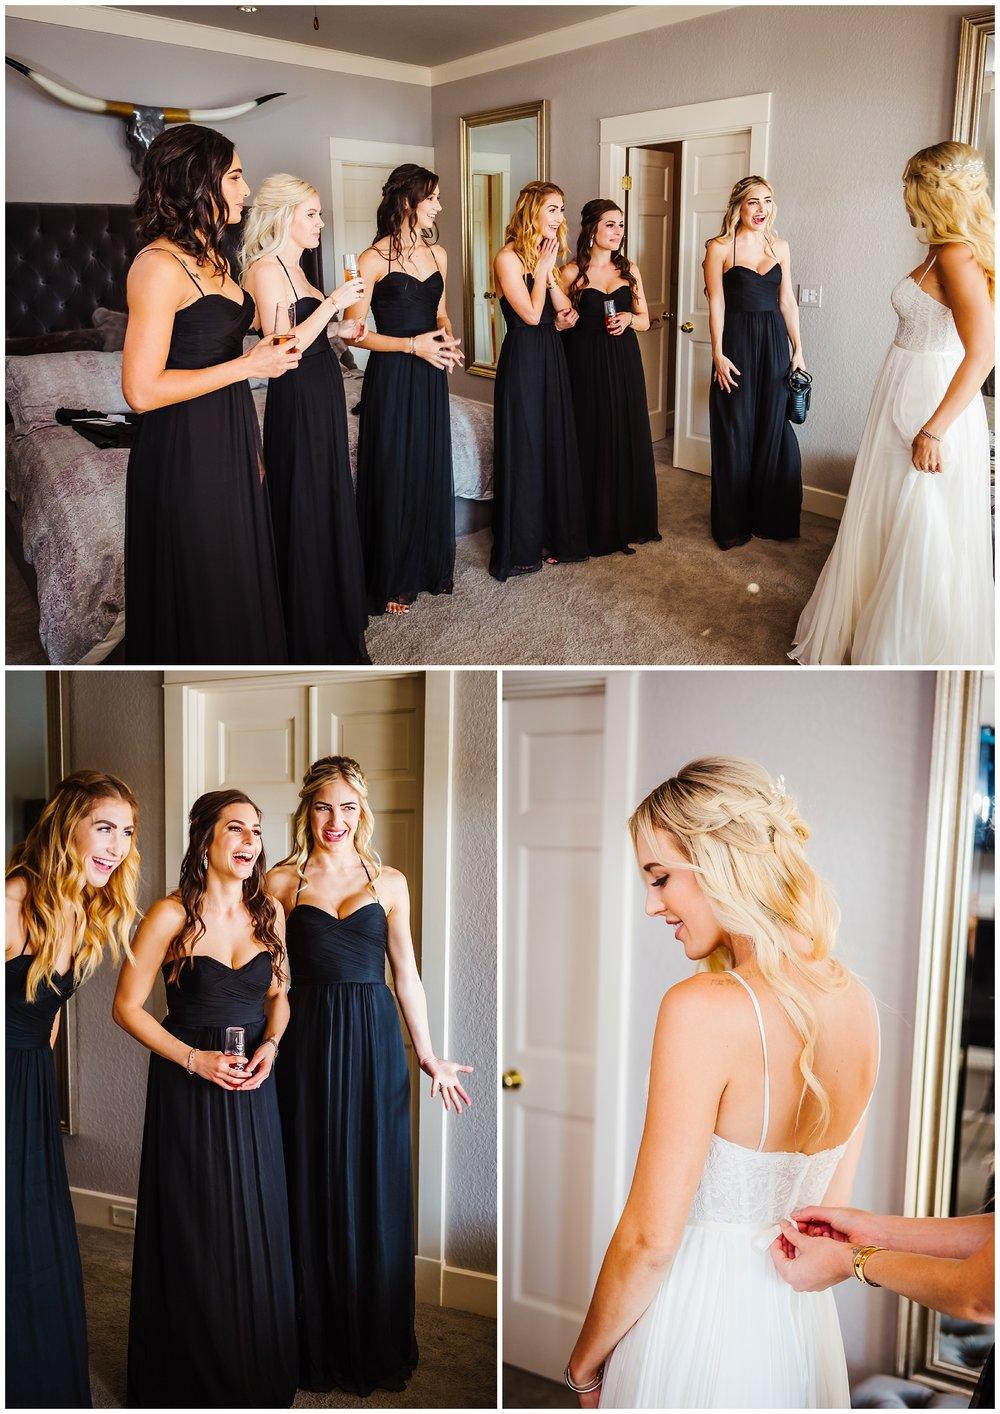 st-pete-wedding-photographer-backyard-luxury-snell-isle-vinoy_0010.jpg